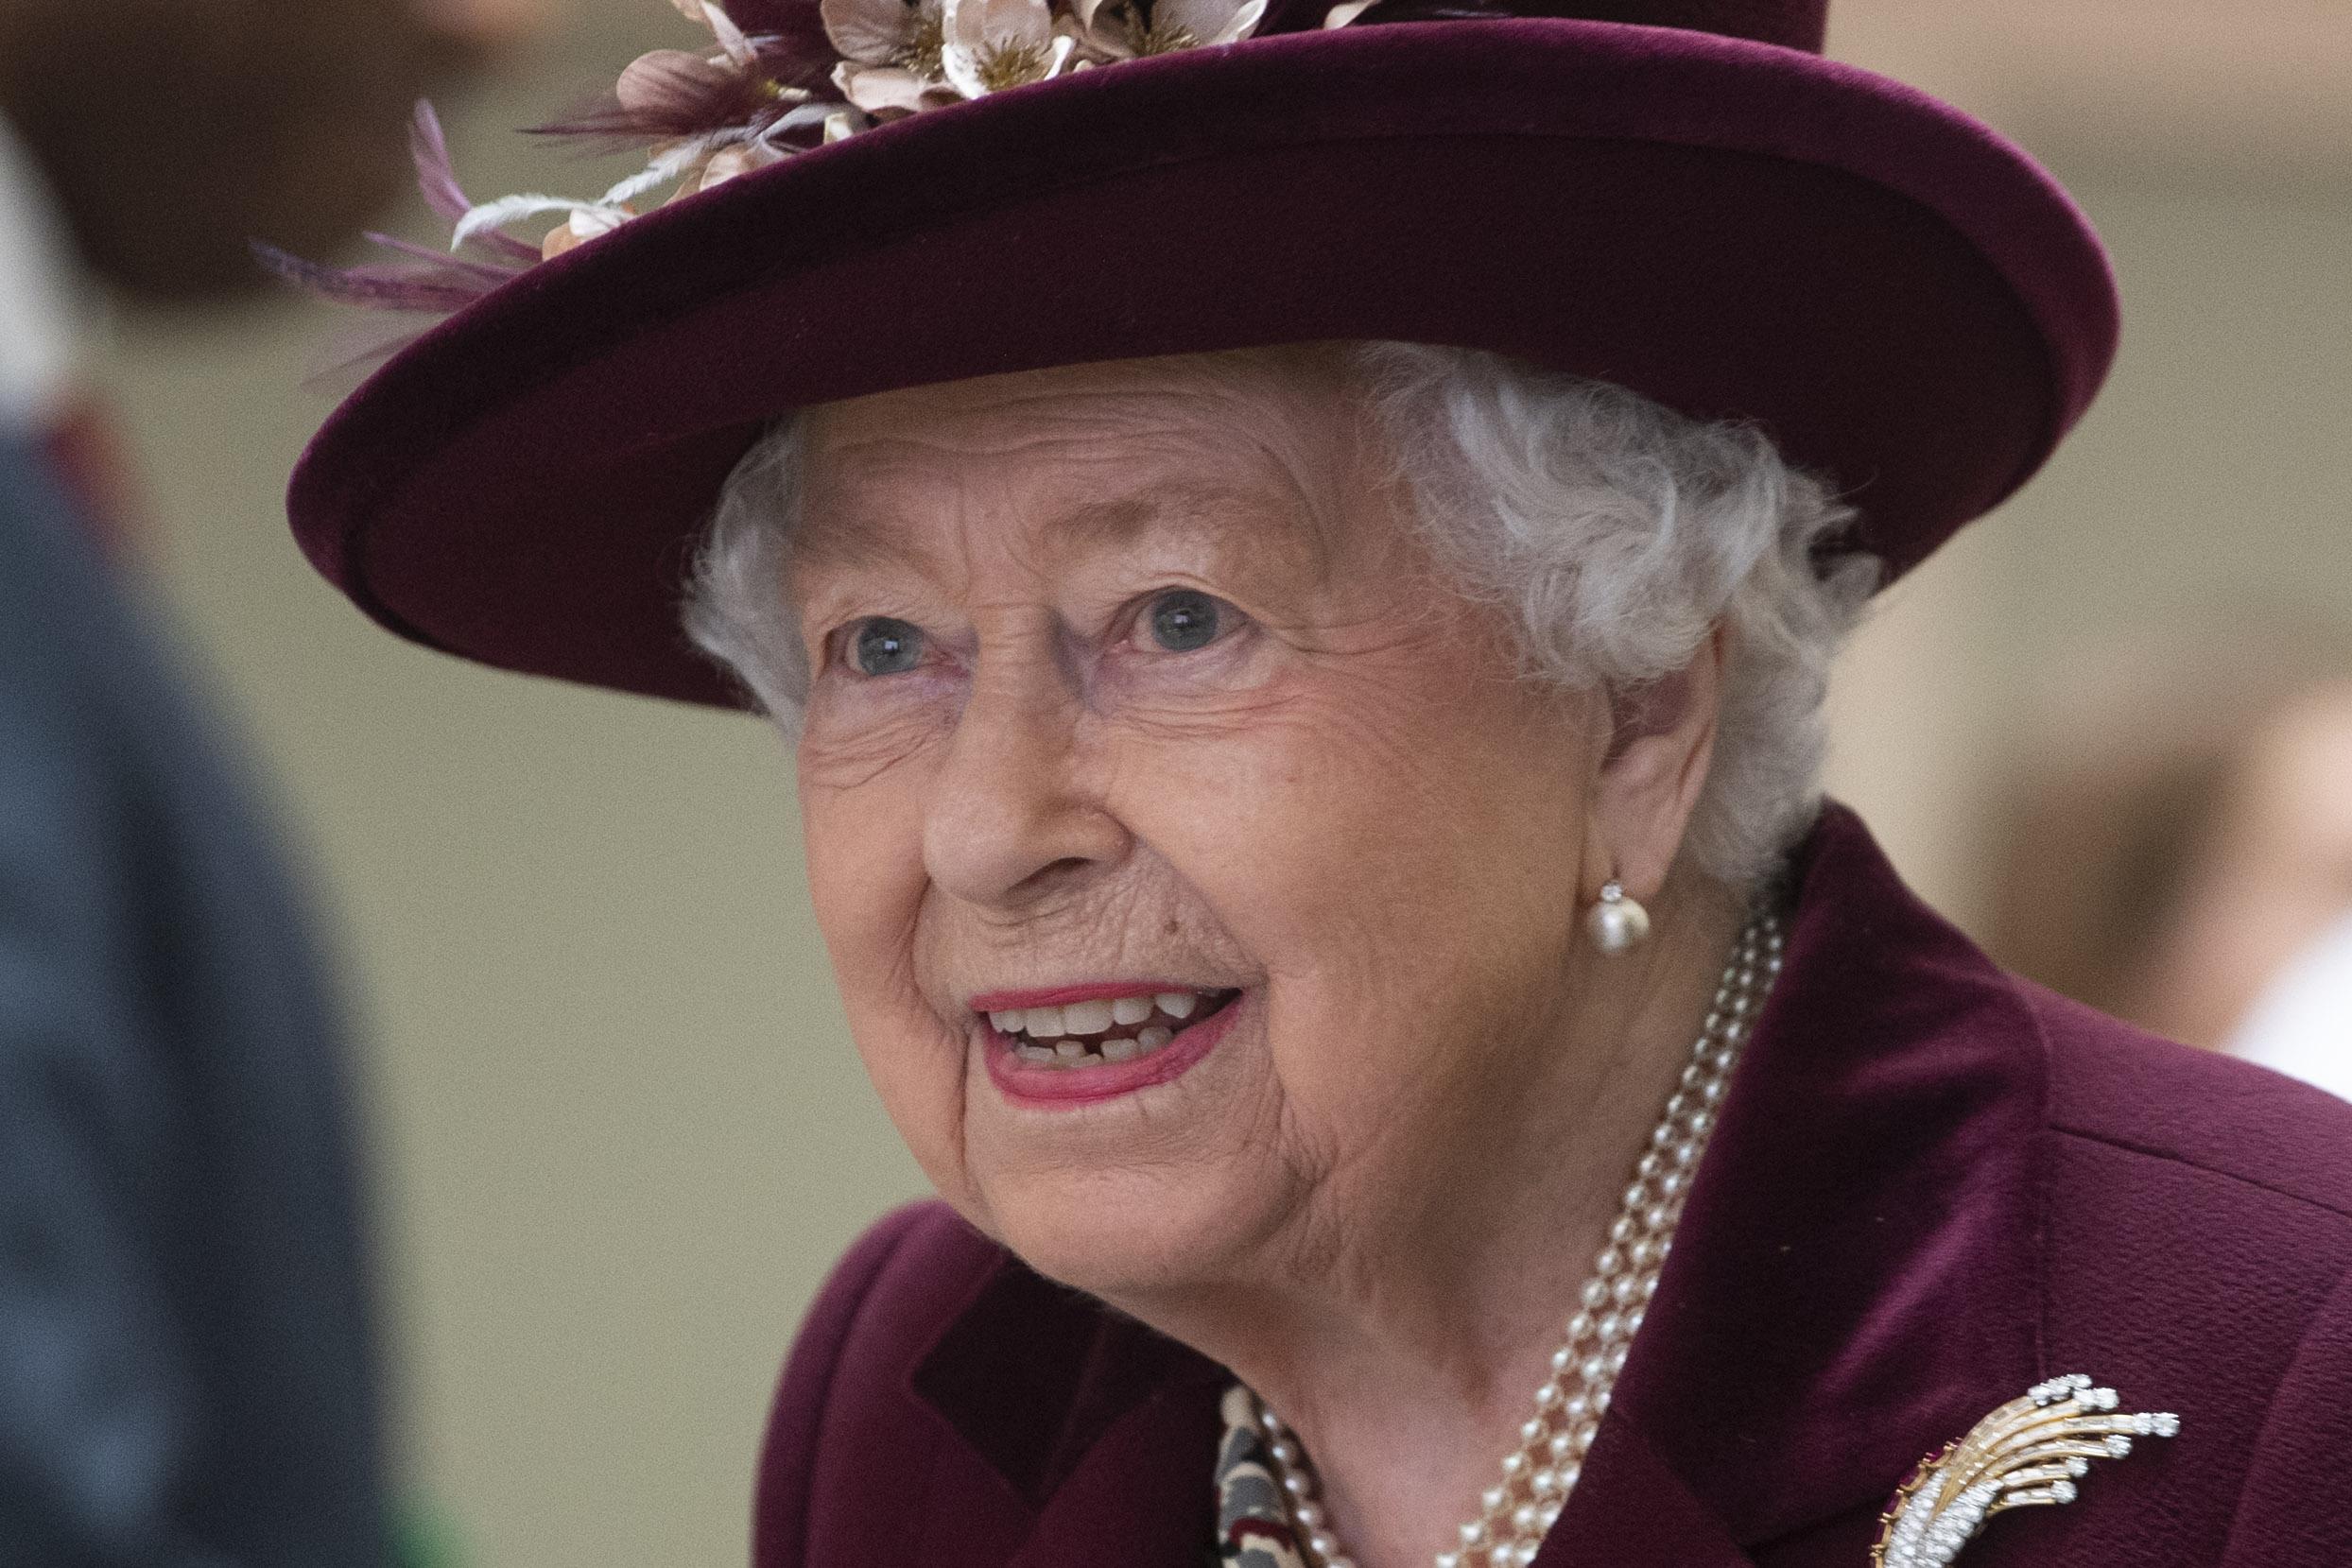 reina isabel II lanza propia marca ginebra